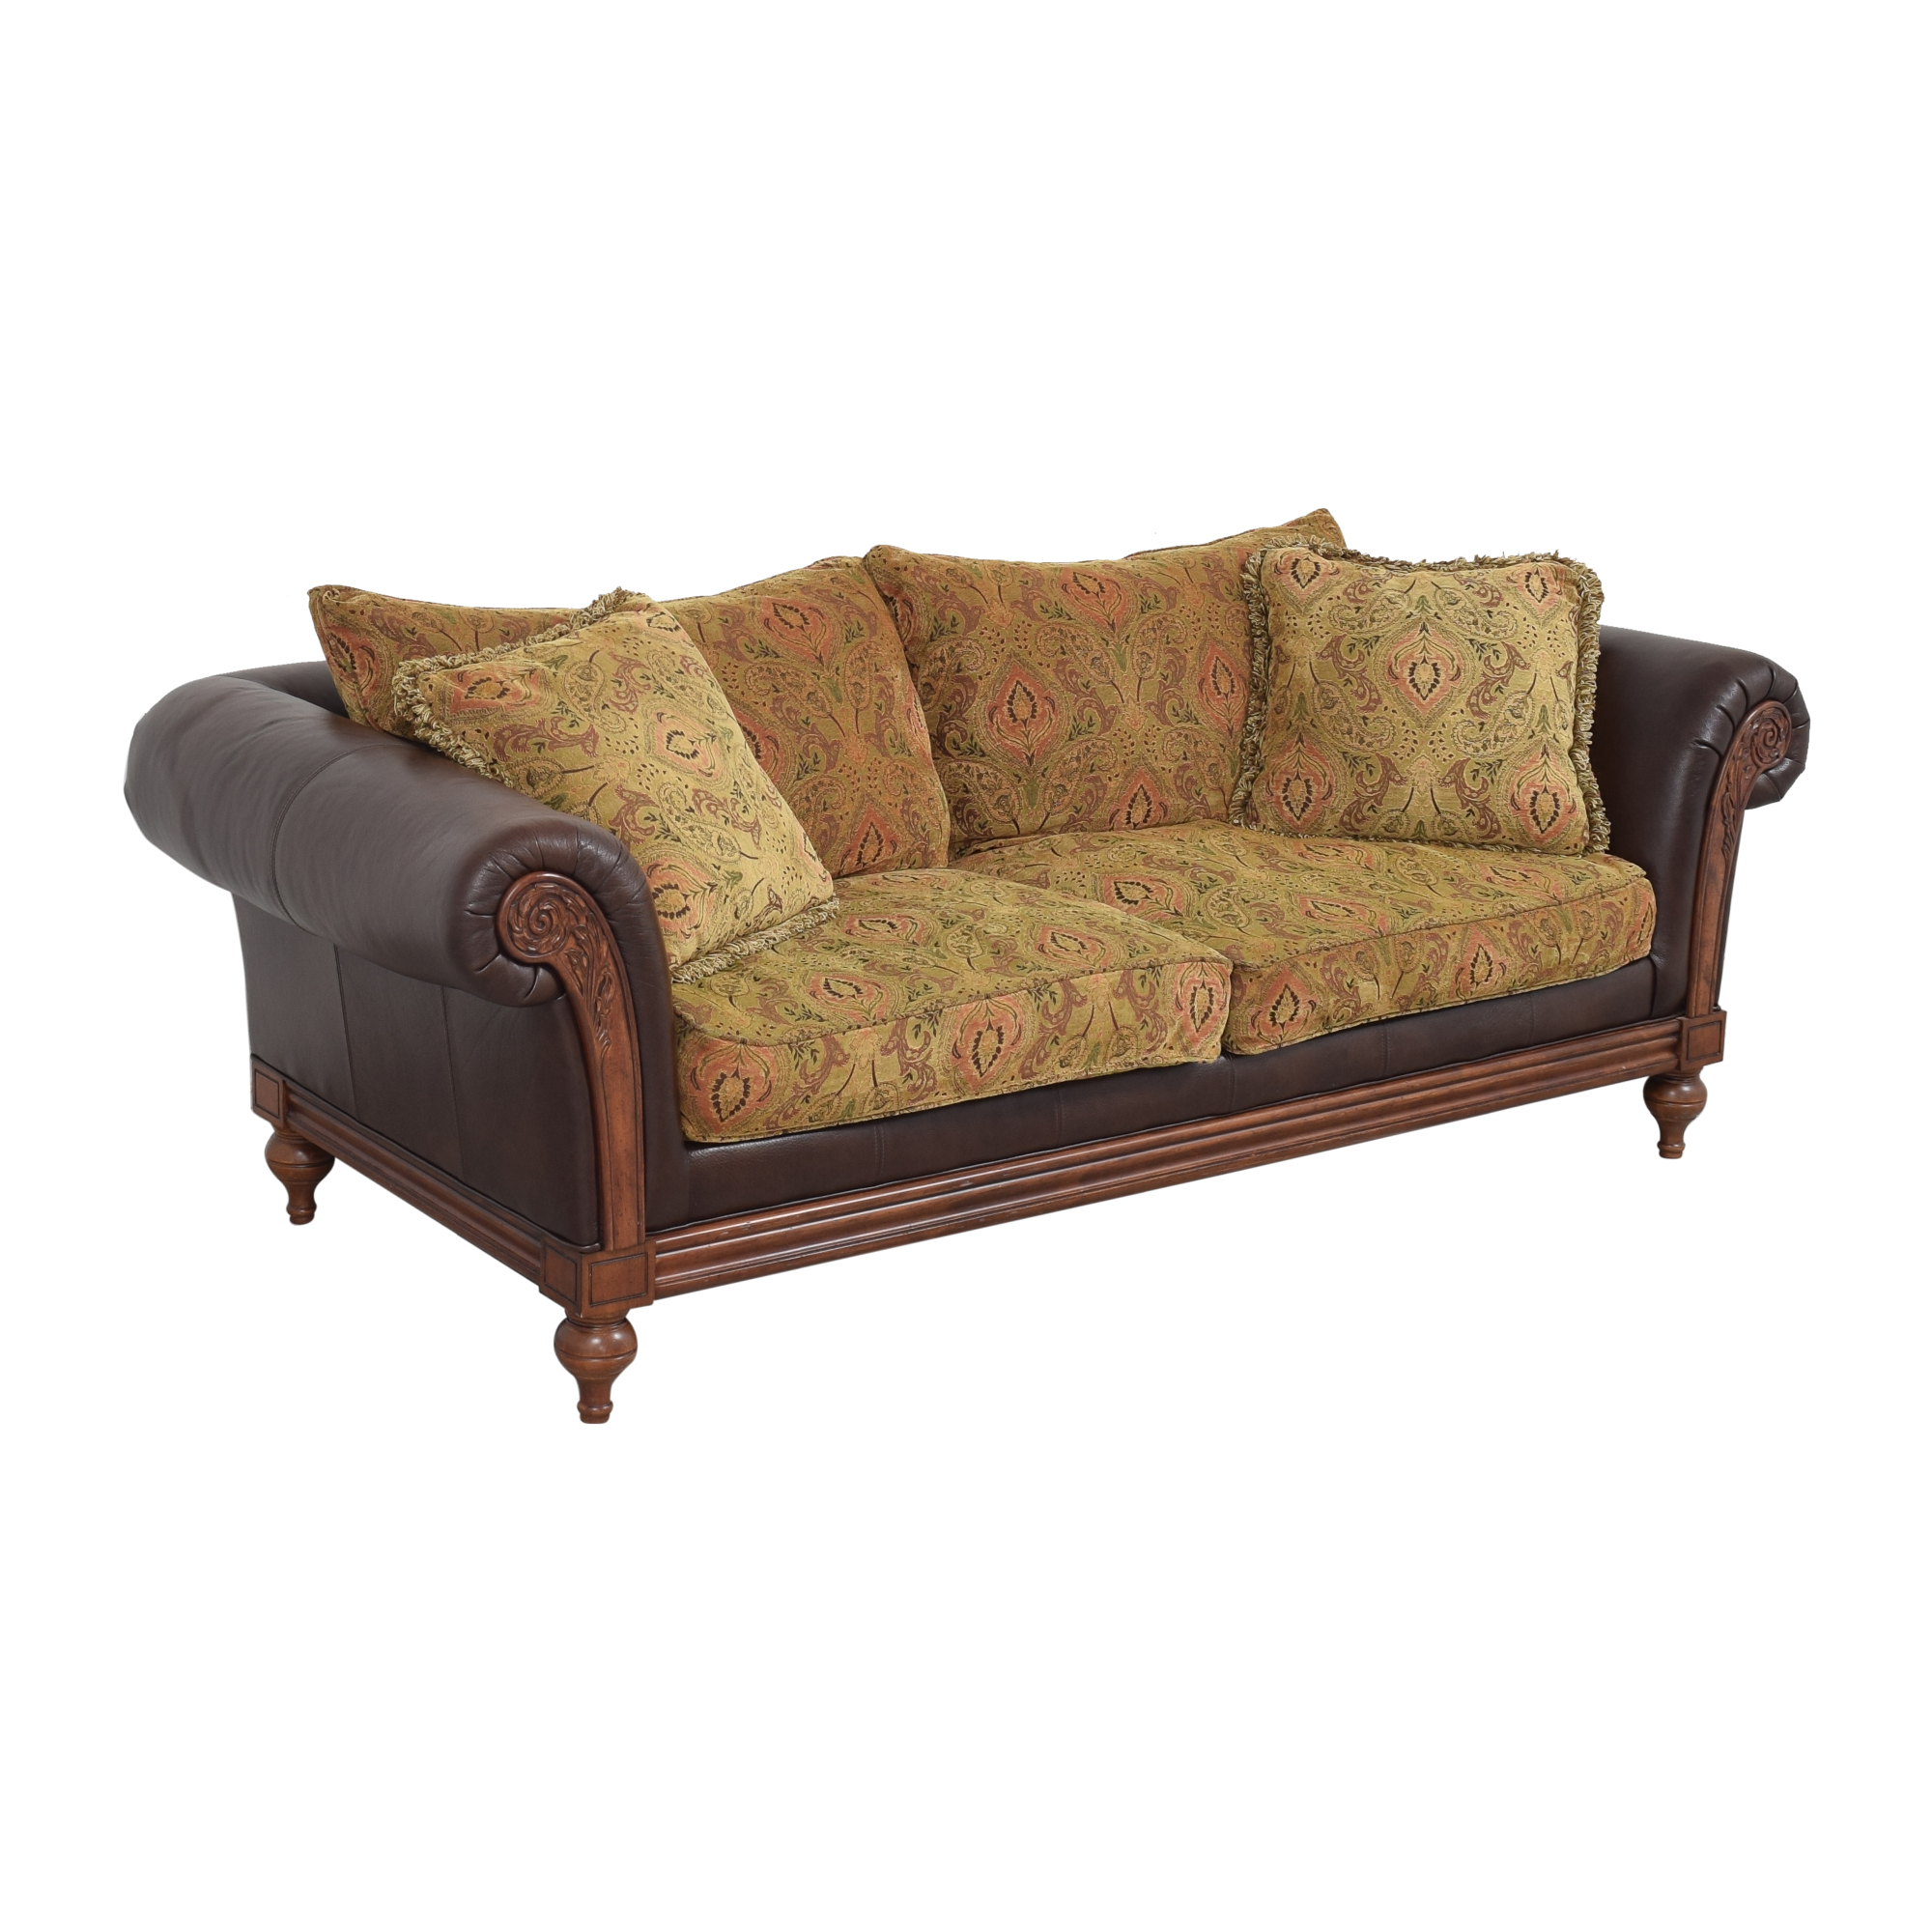 Ethan Allen Ethan Allen Pratt Sofa dimensions